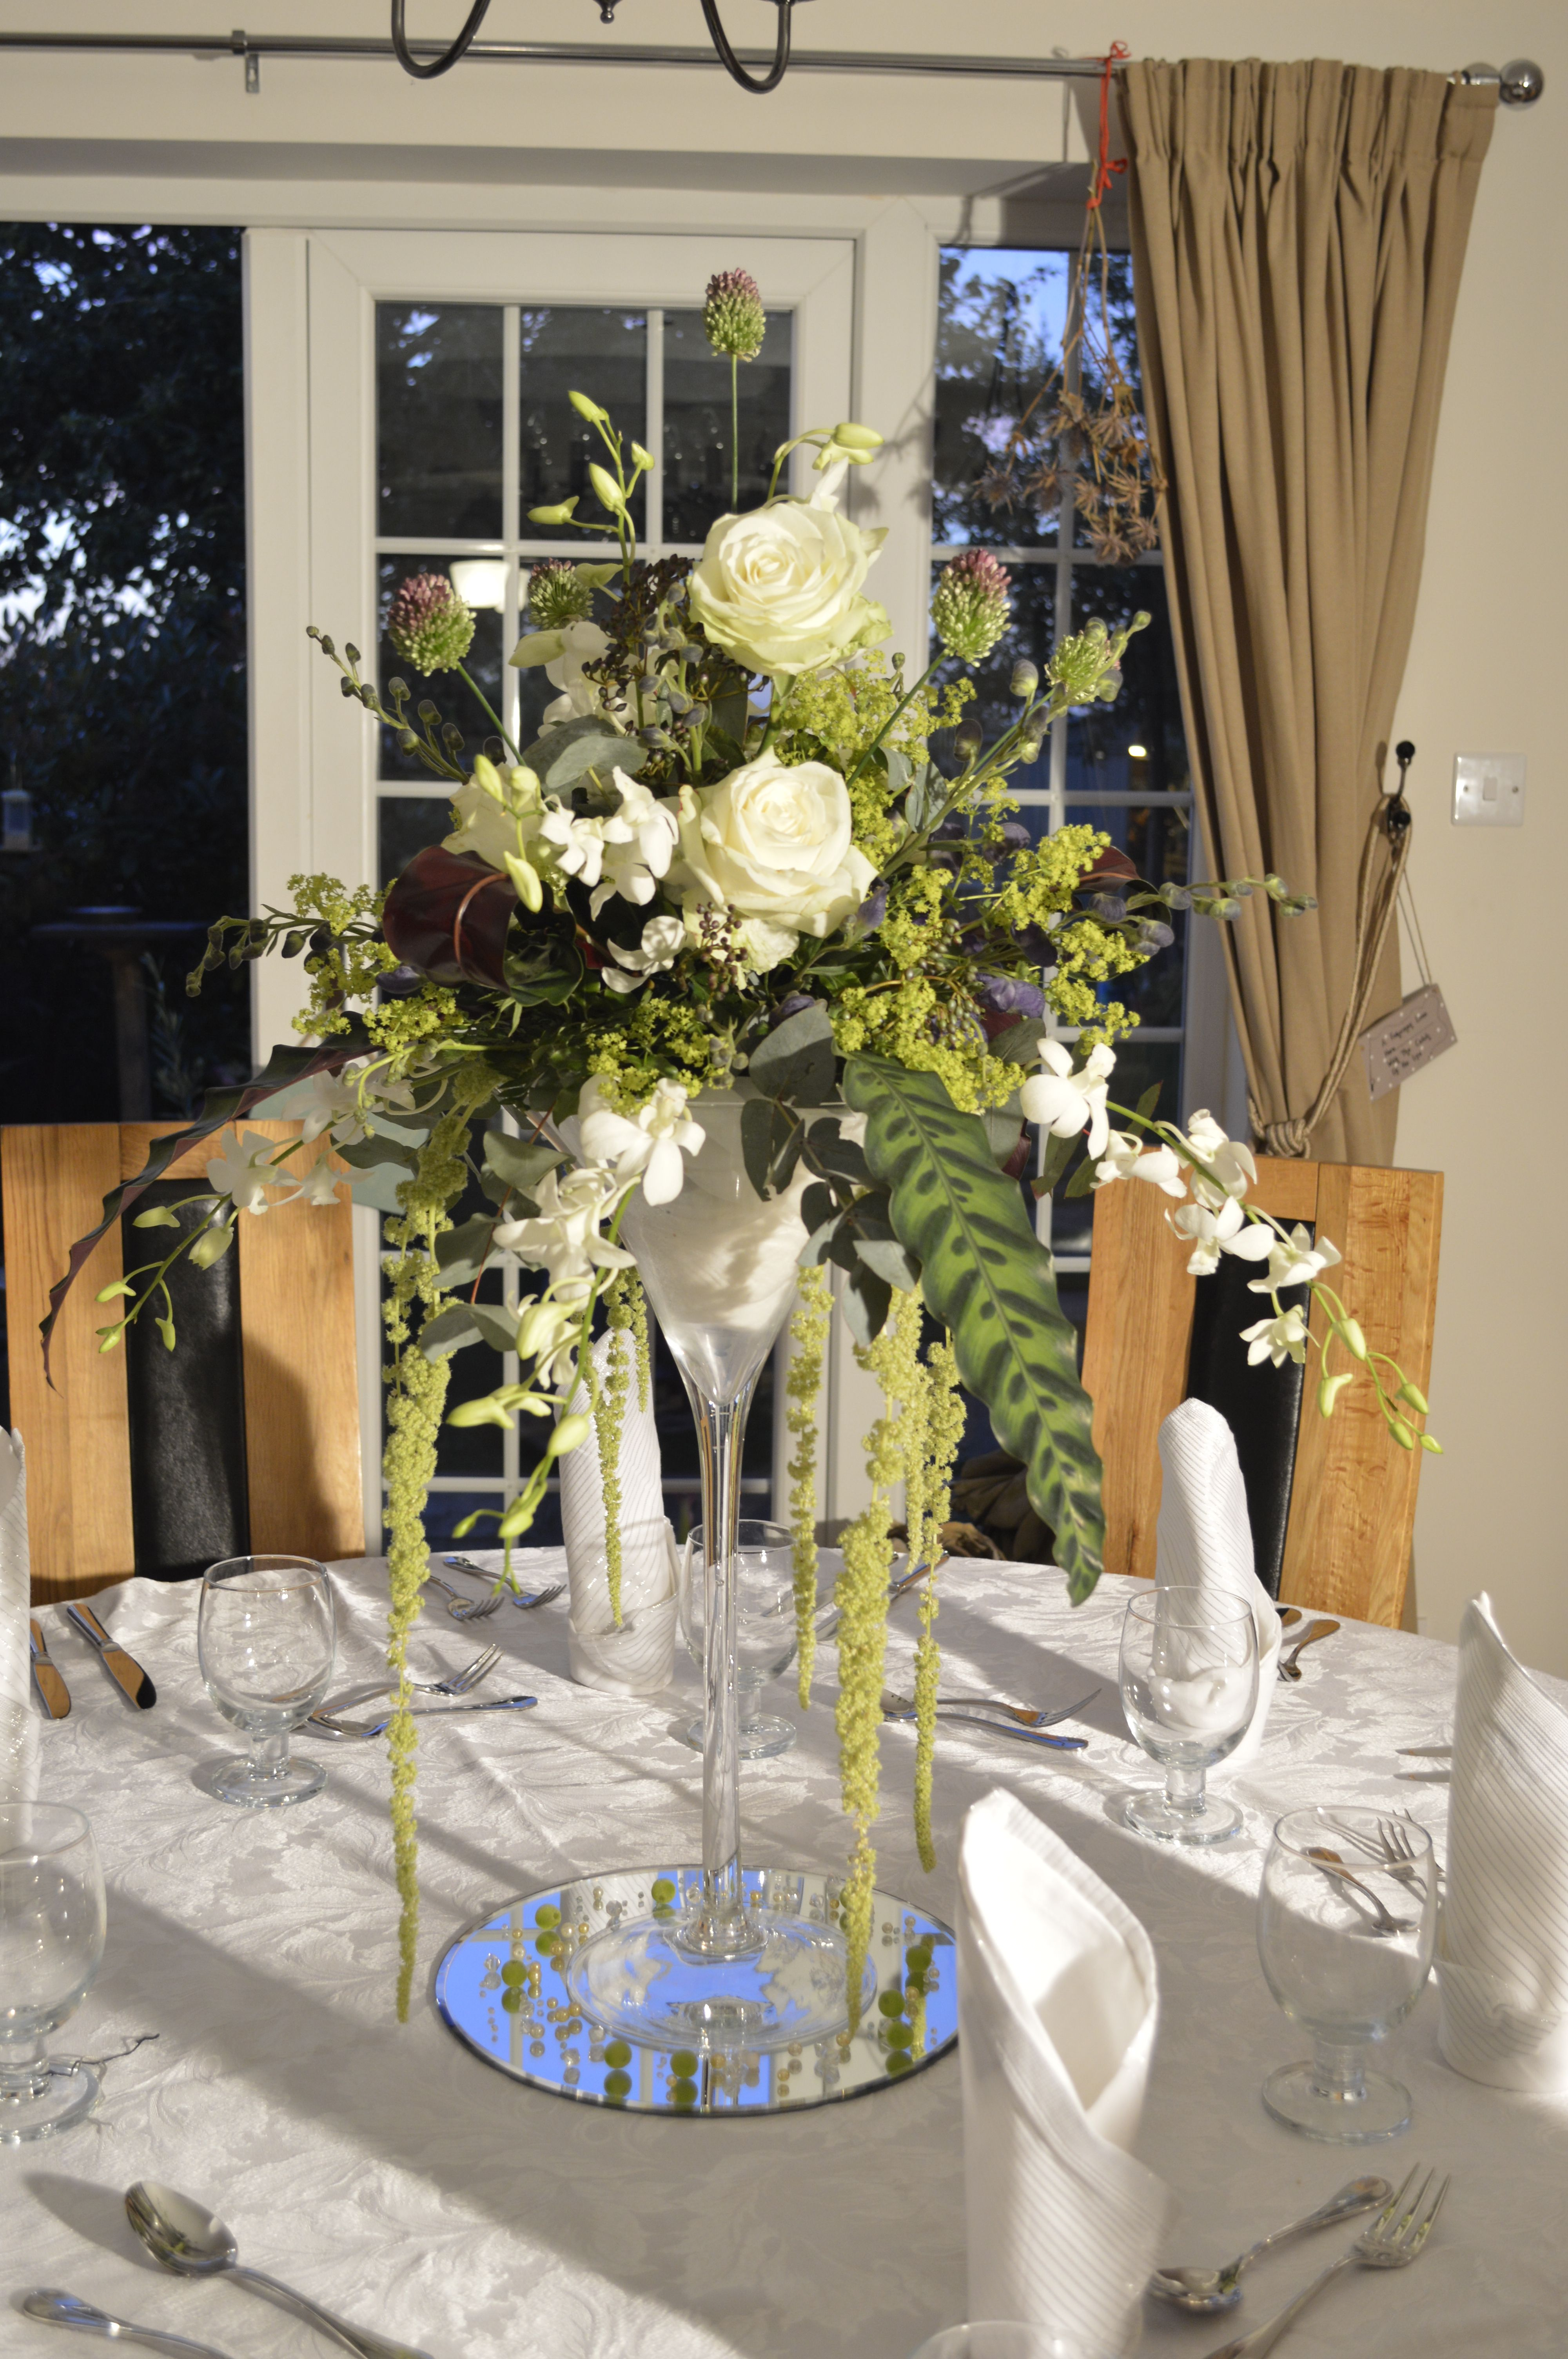 Martini glass vase wedding table centre flower arrangement martini glass vase wedding table centre flower arrangement created and designed by artistic floral services reviewsmspy